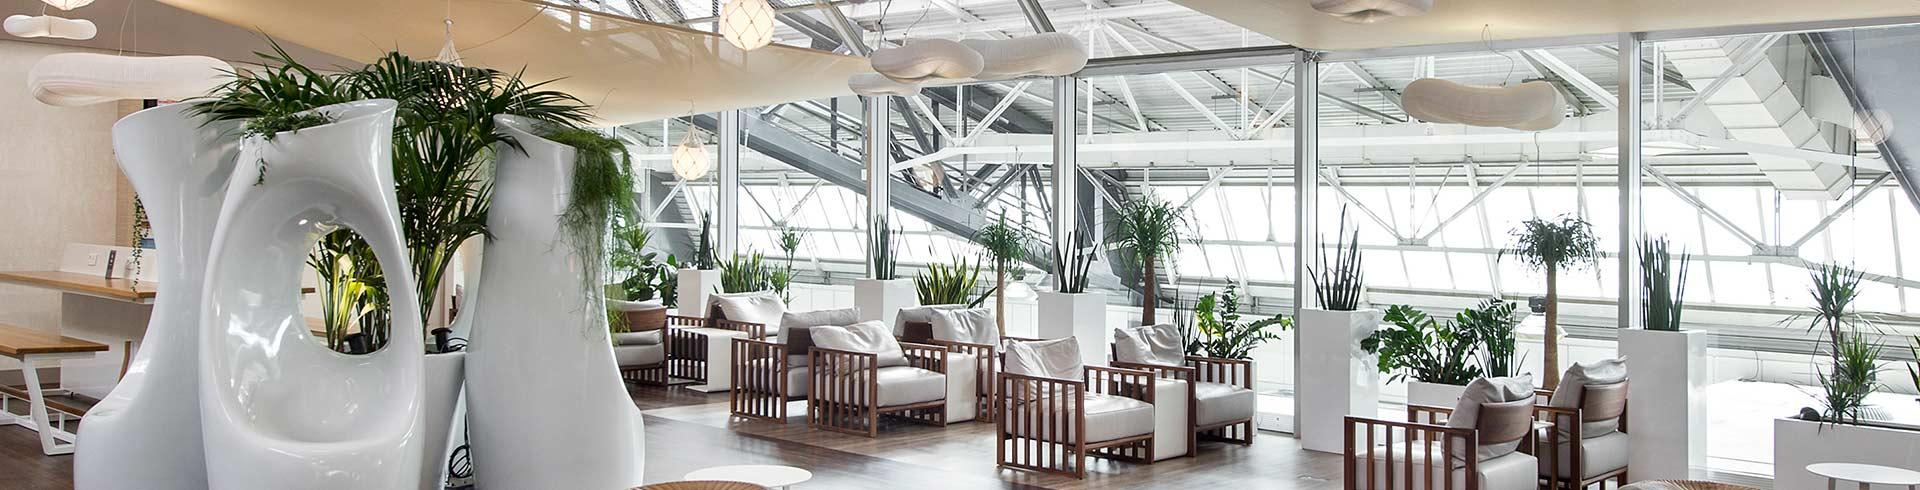 Salon Canopy Terminal 1